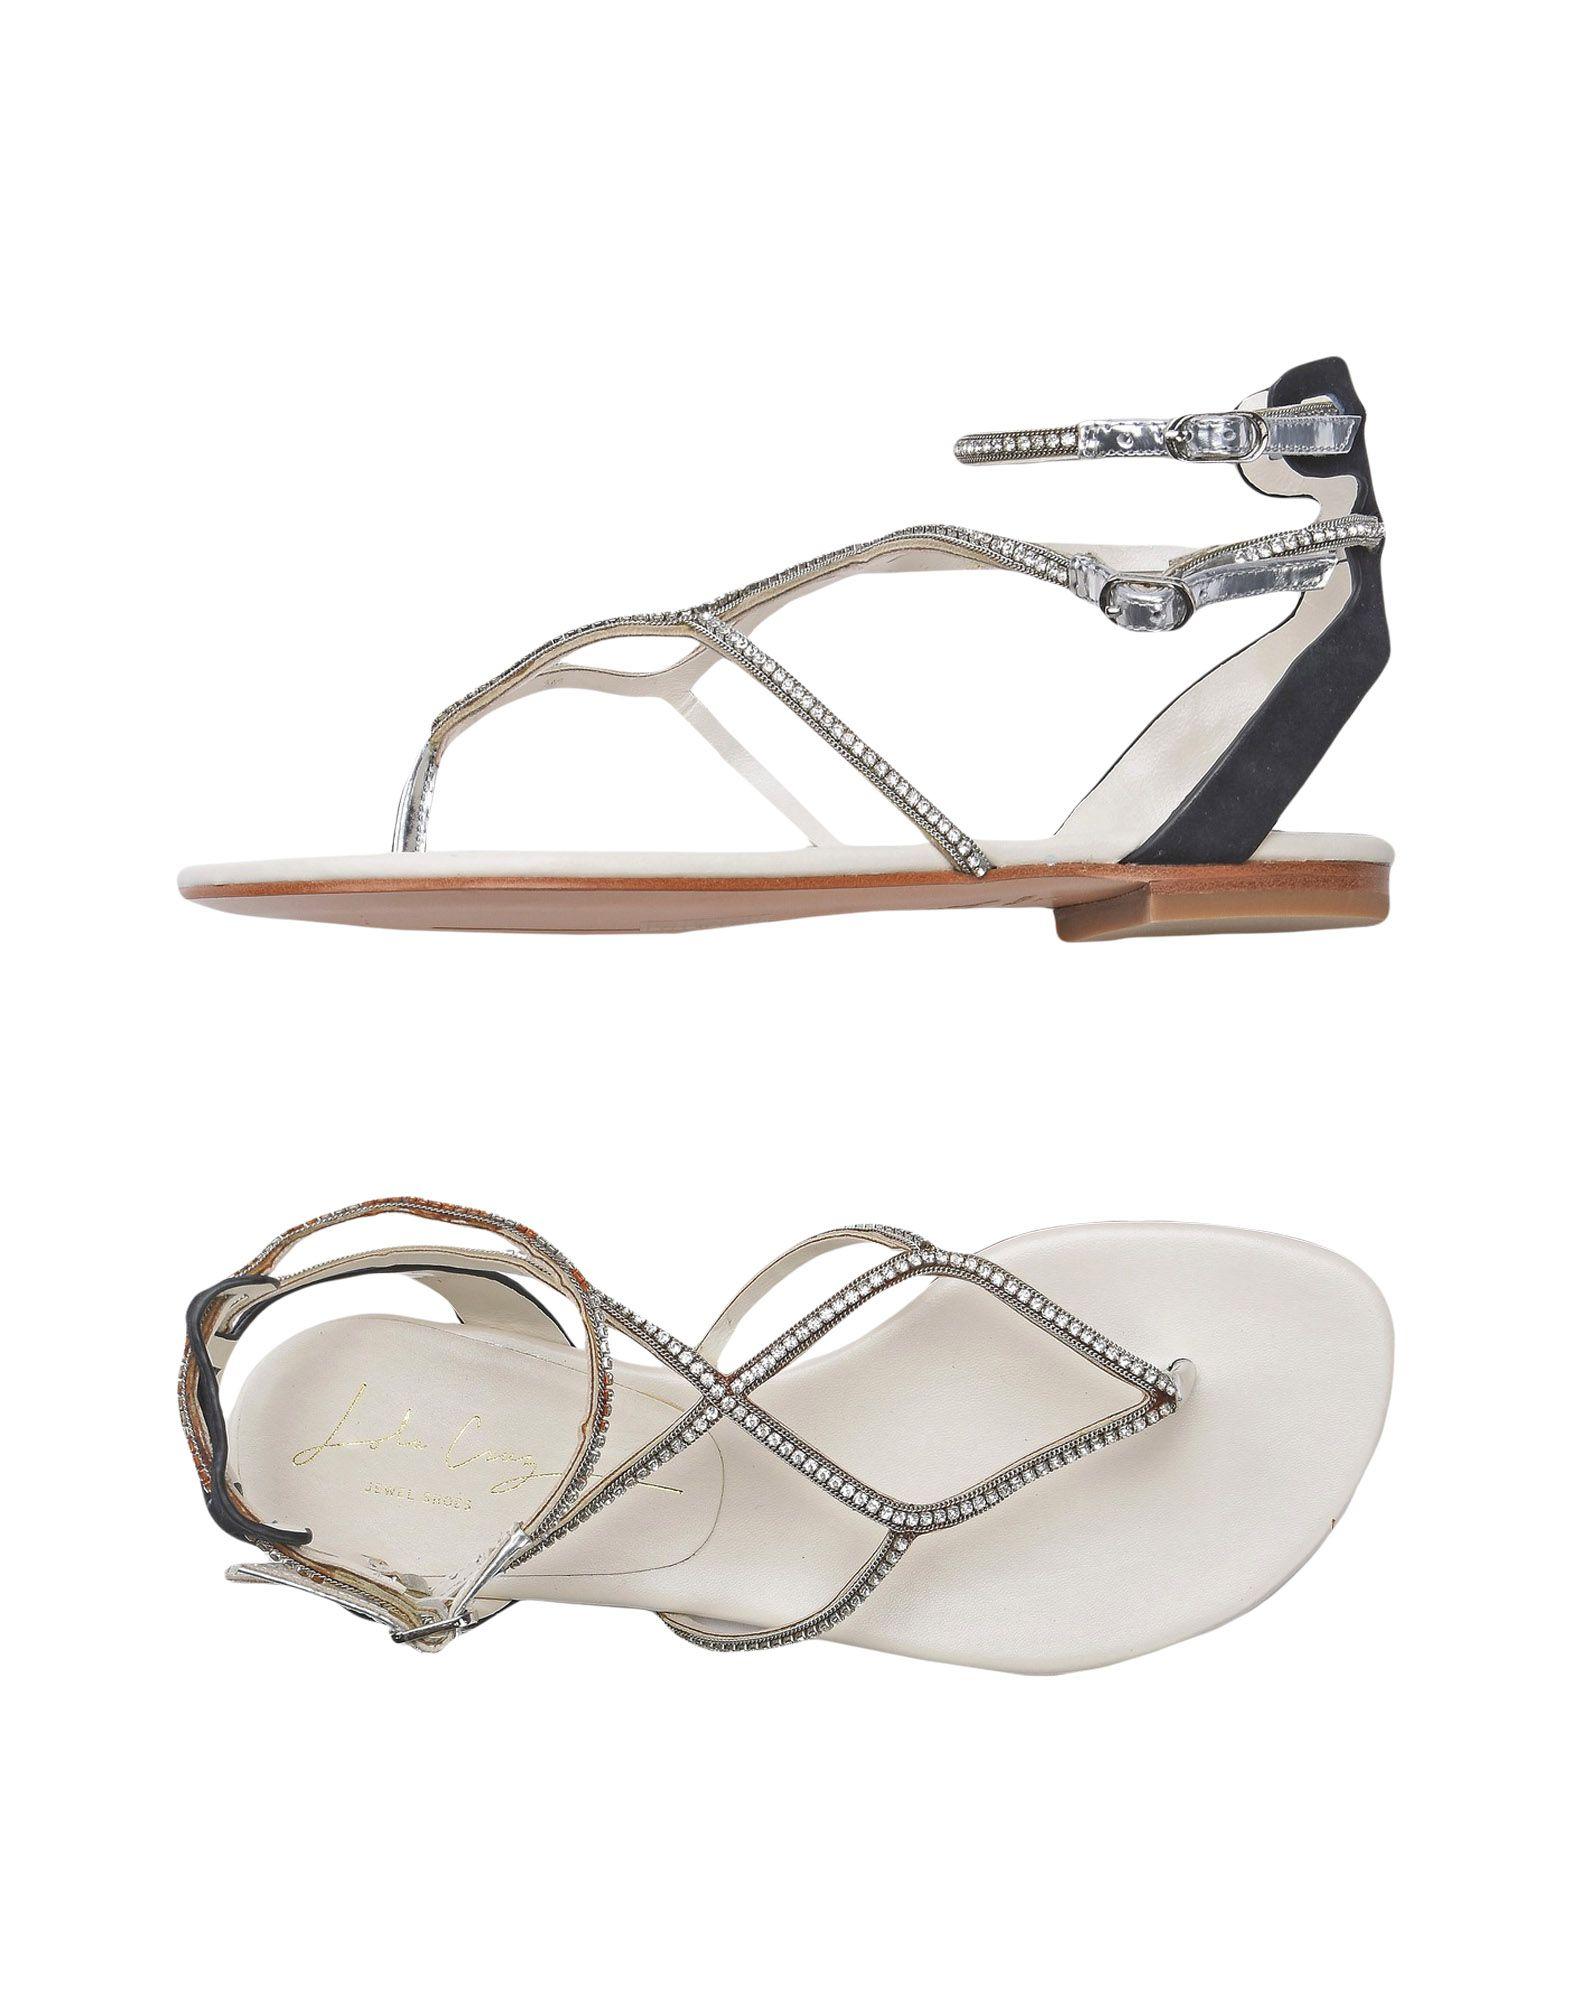 Lola Cruz Dianetten 11347141QA Damen  11347141QA Dianetten Gute Qualität beliebte Schuhe 375b44